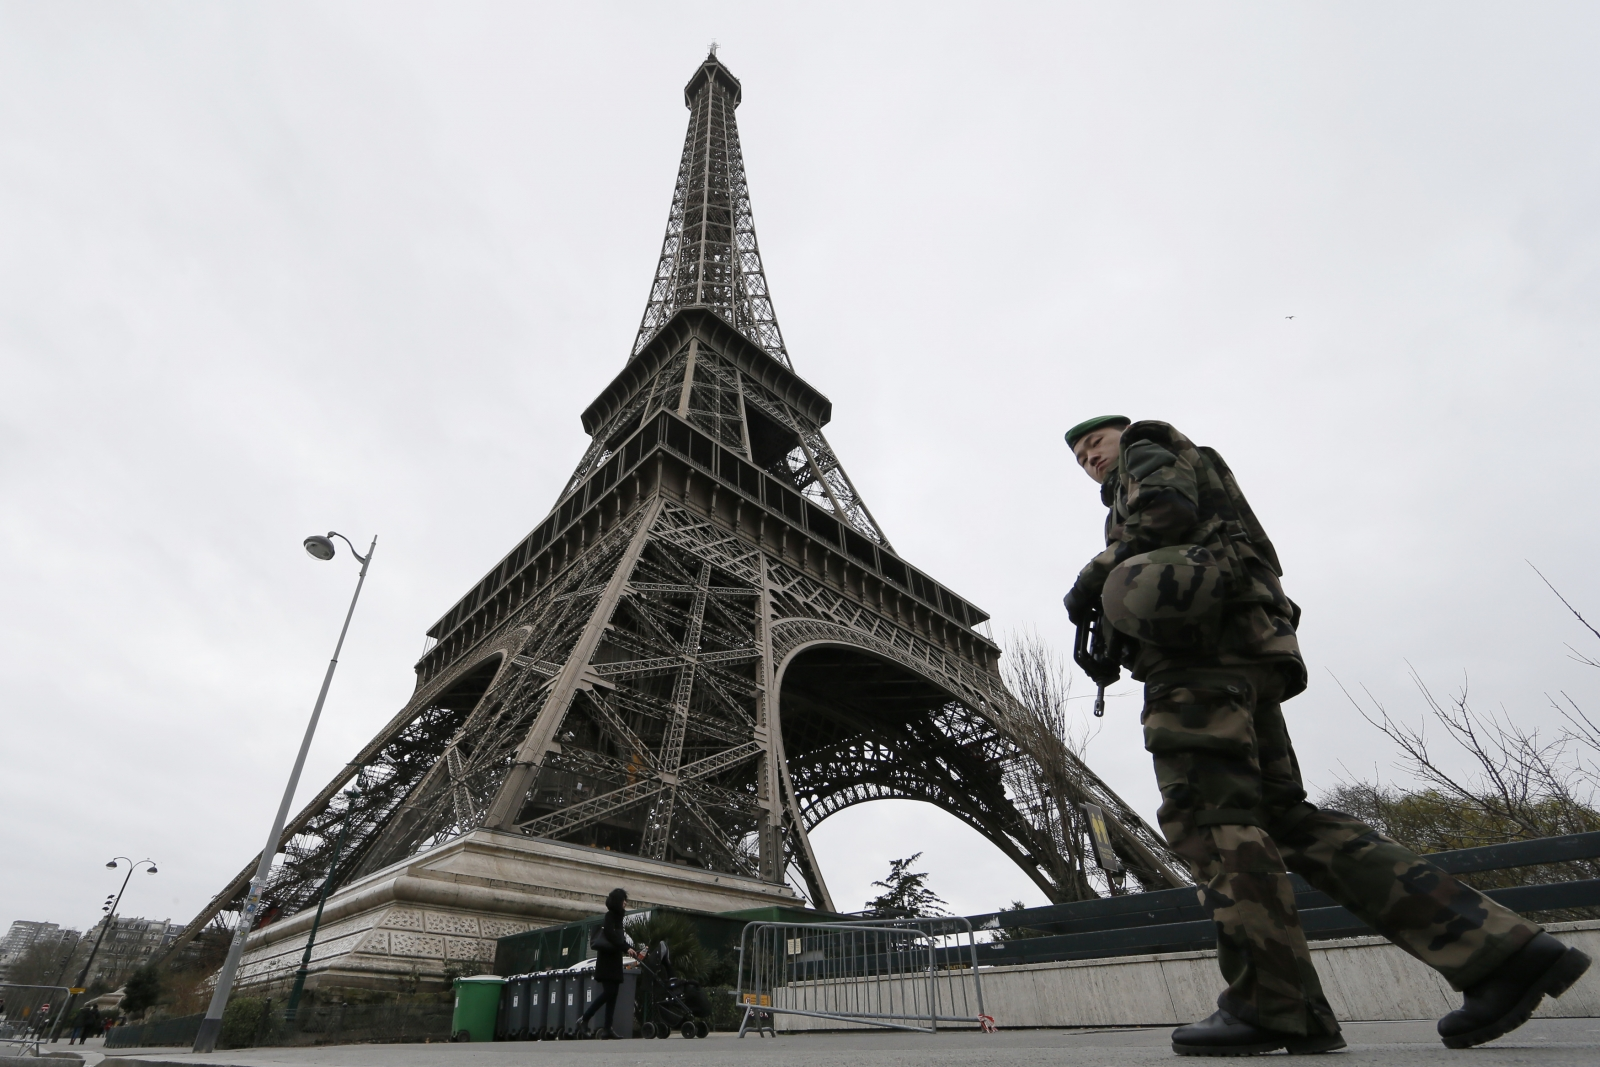 Paris unidentified drones